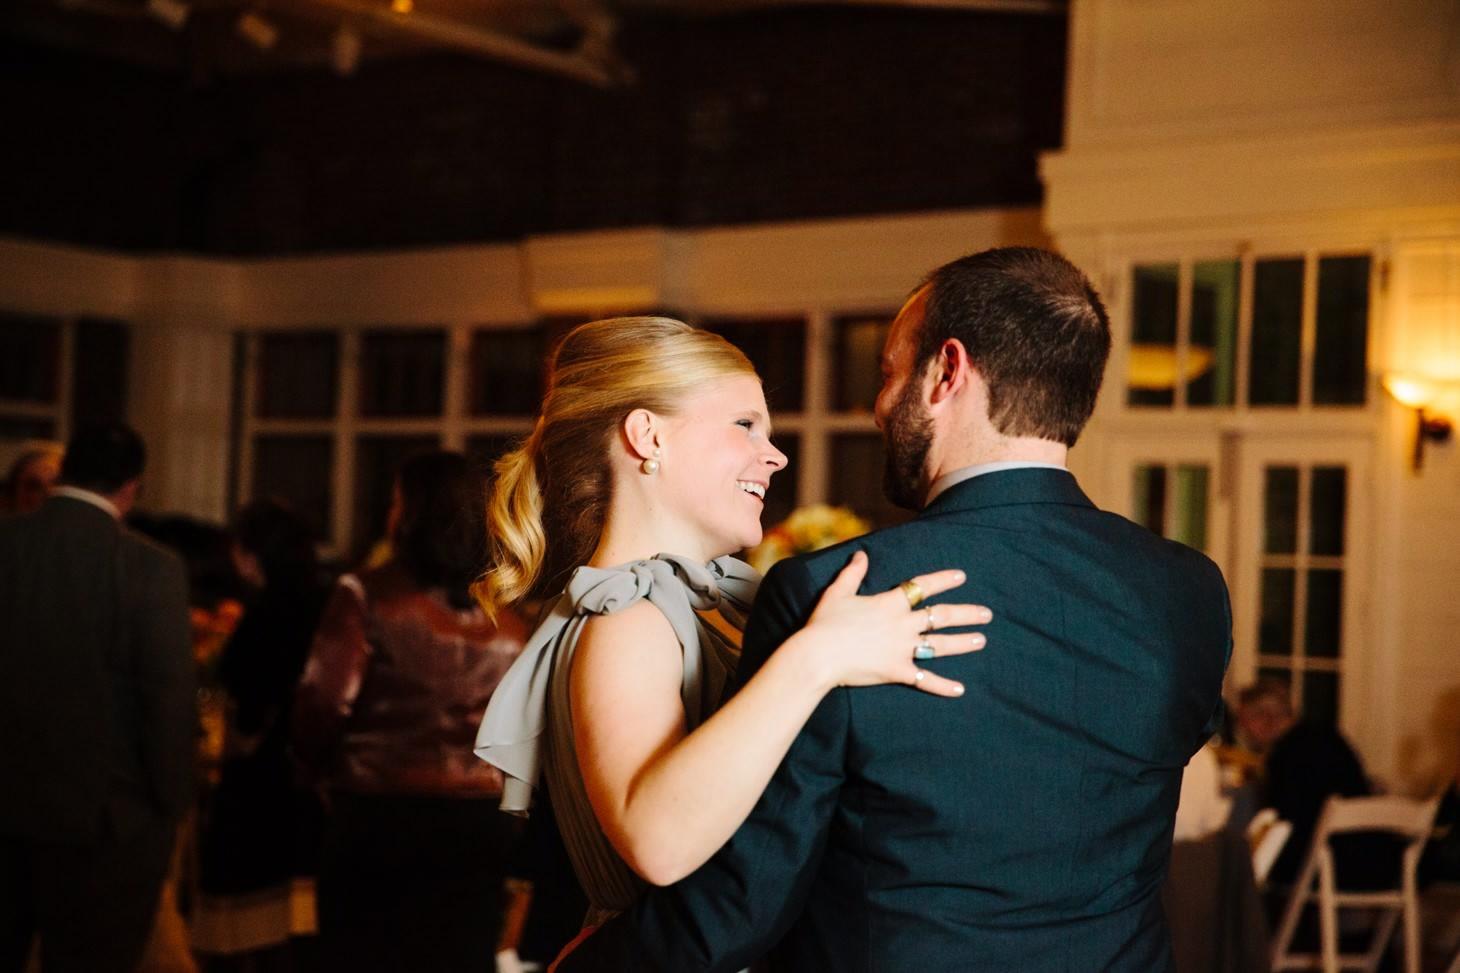 nyc-brooklyn-prospect-park-picnic-house-wedding-smitten-chickens-nerdy-64.jpg